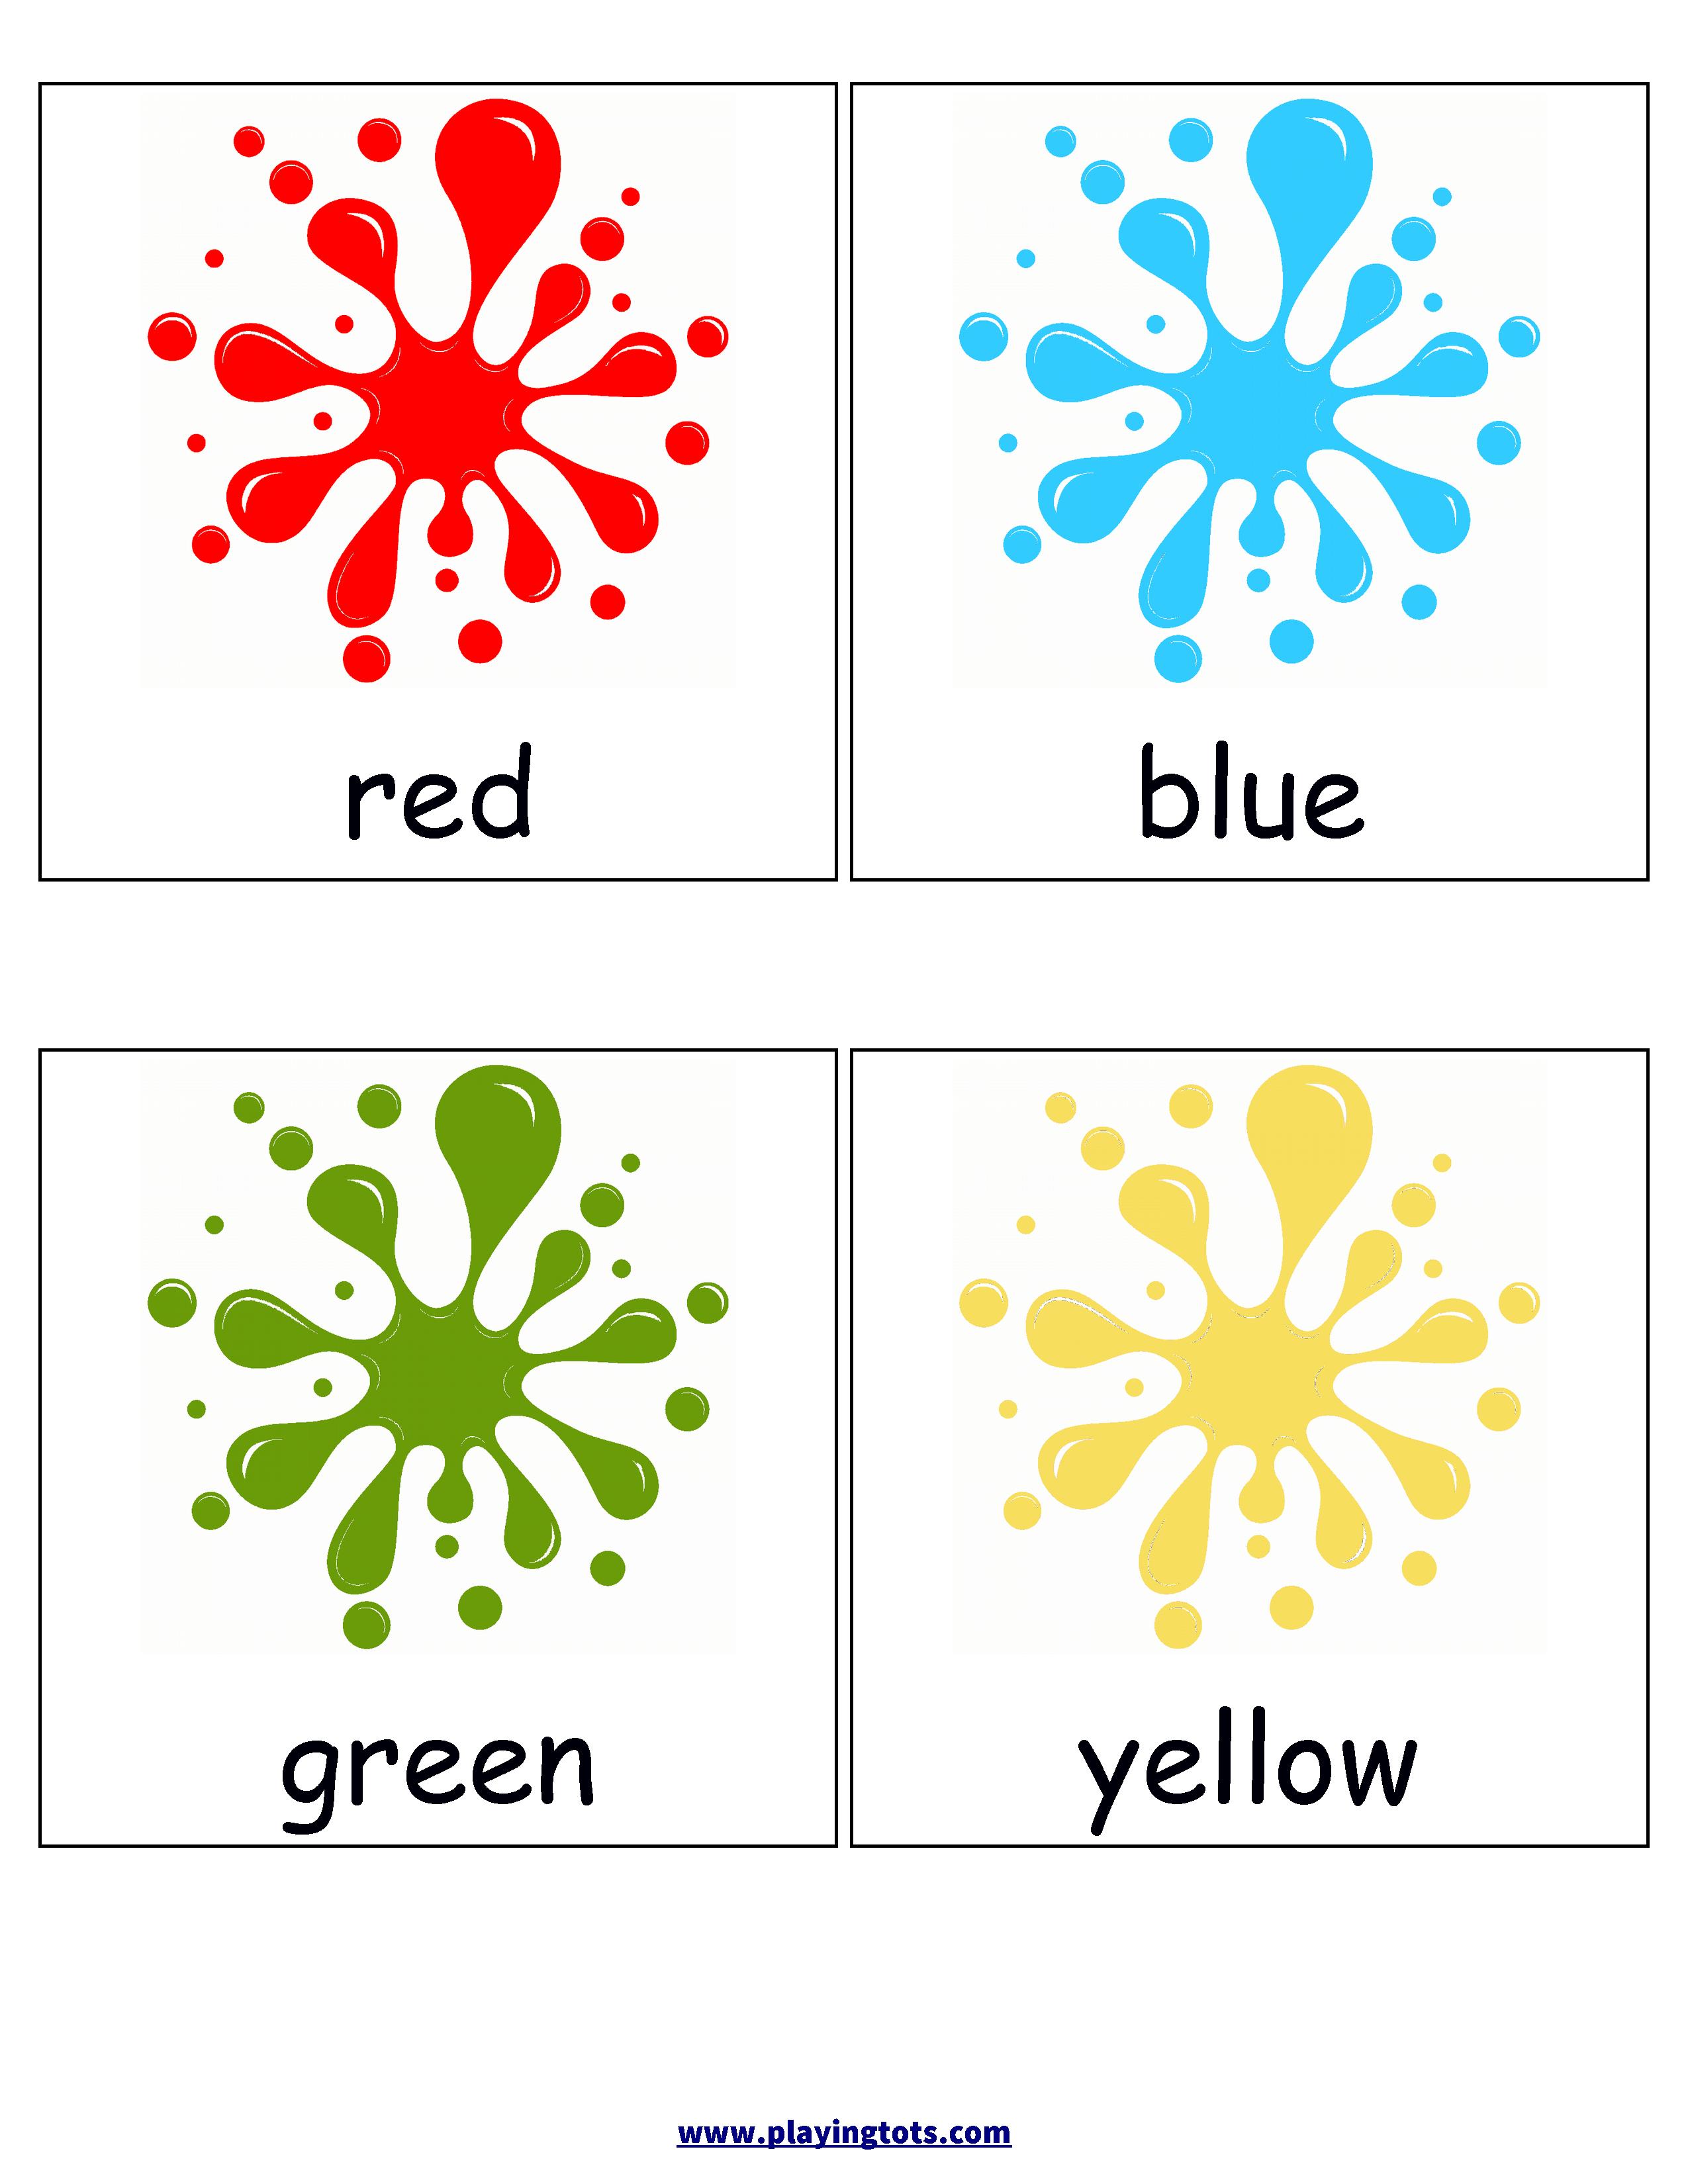 Color Flashcards | ~Colors~ | Color Flashcards, Flashcards For Kids - Free Printable Colour Flashcards